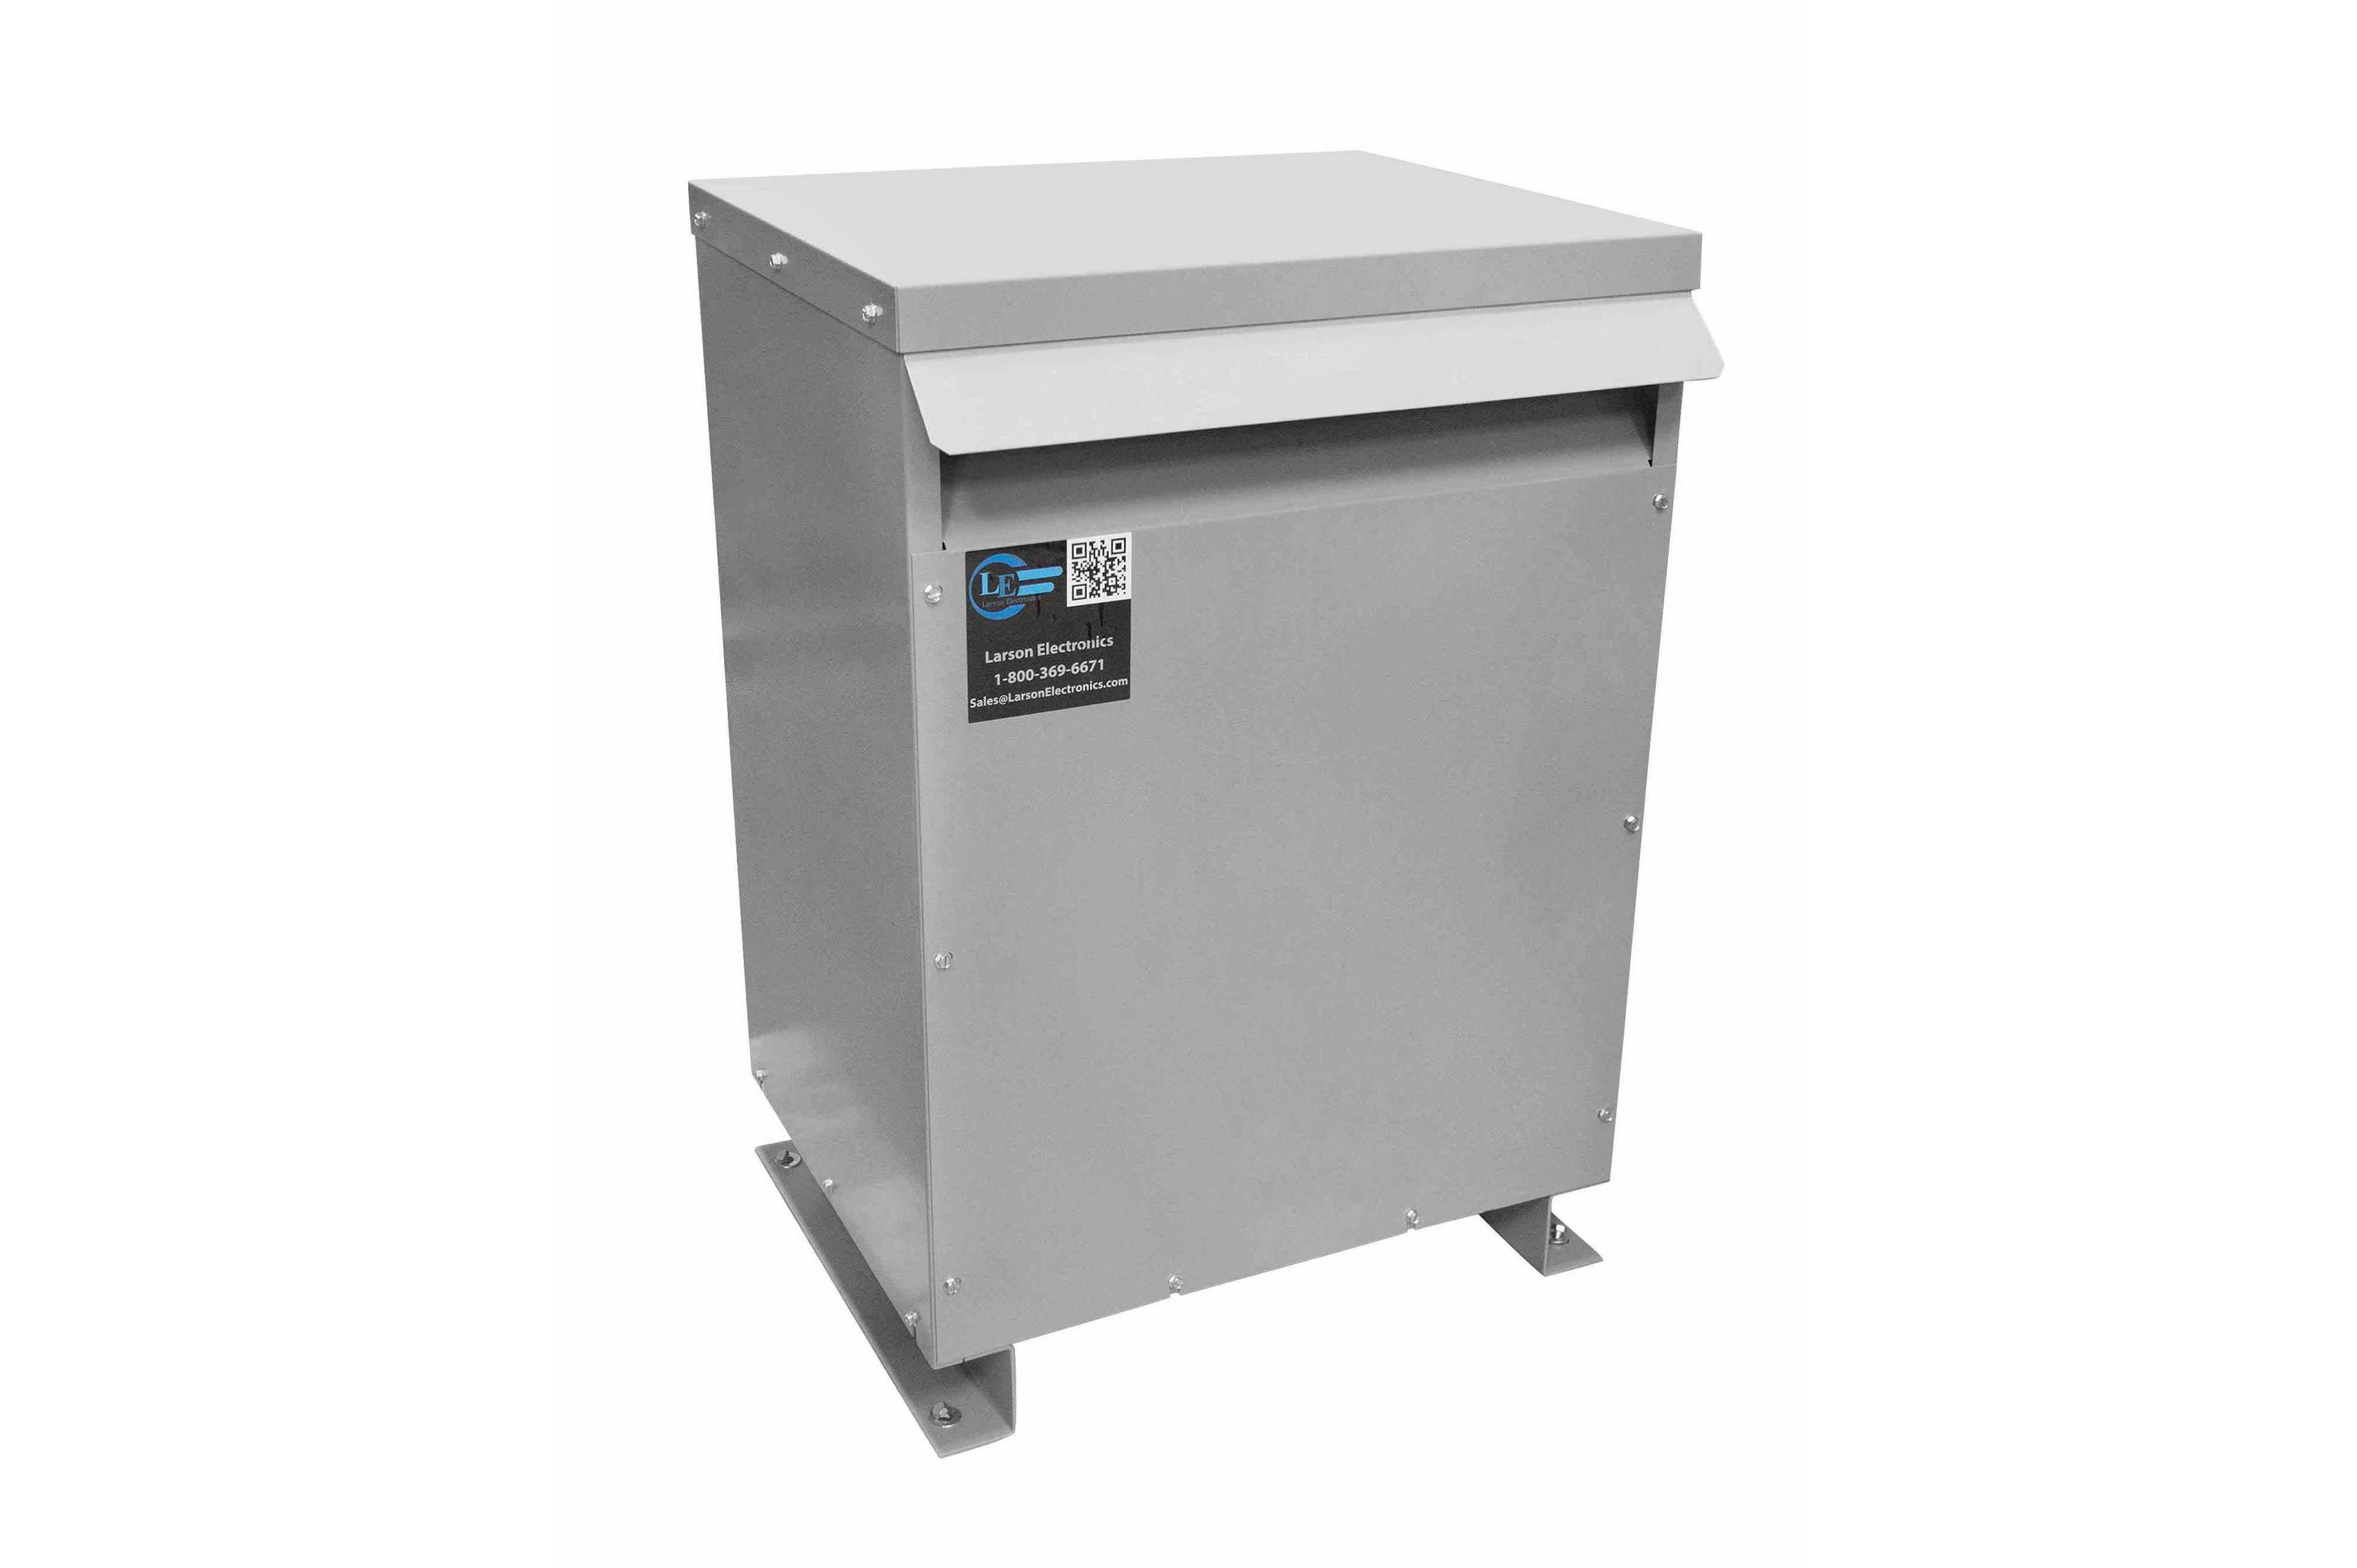 12 kVA 3PH Isolation Transformer, 440V Wye Primary, 240V Delta Secondary, N3R, Ventilated, 60 Hz